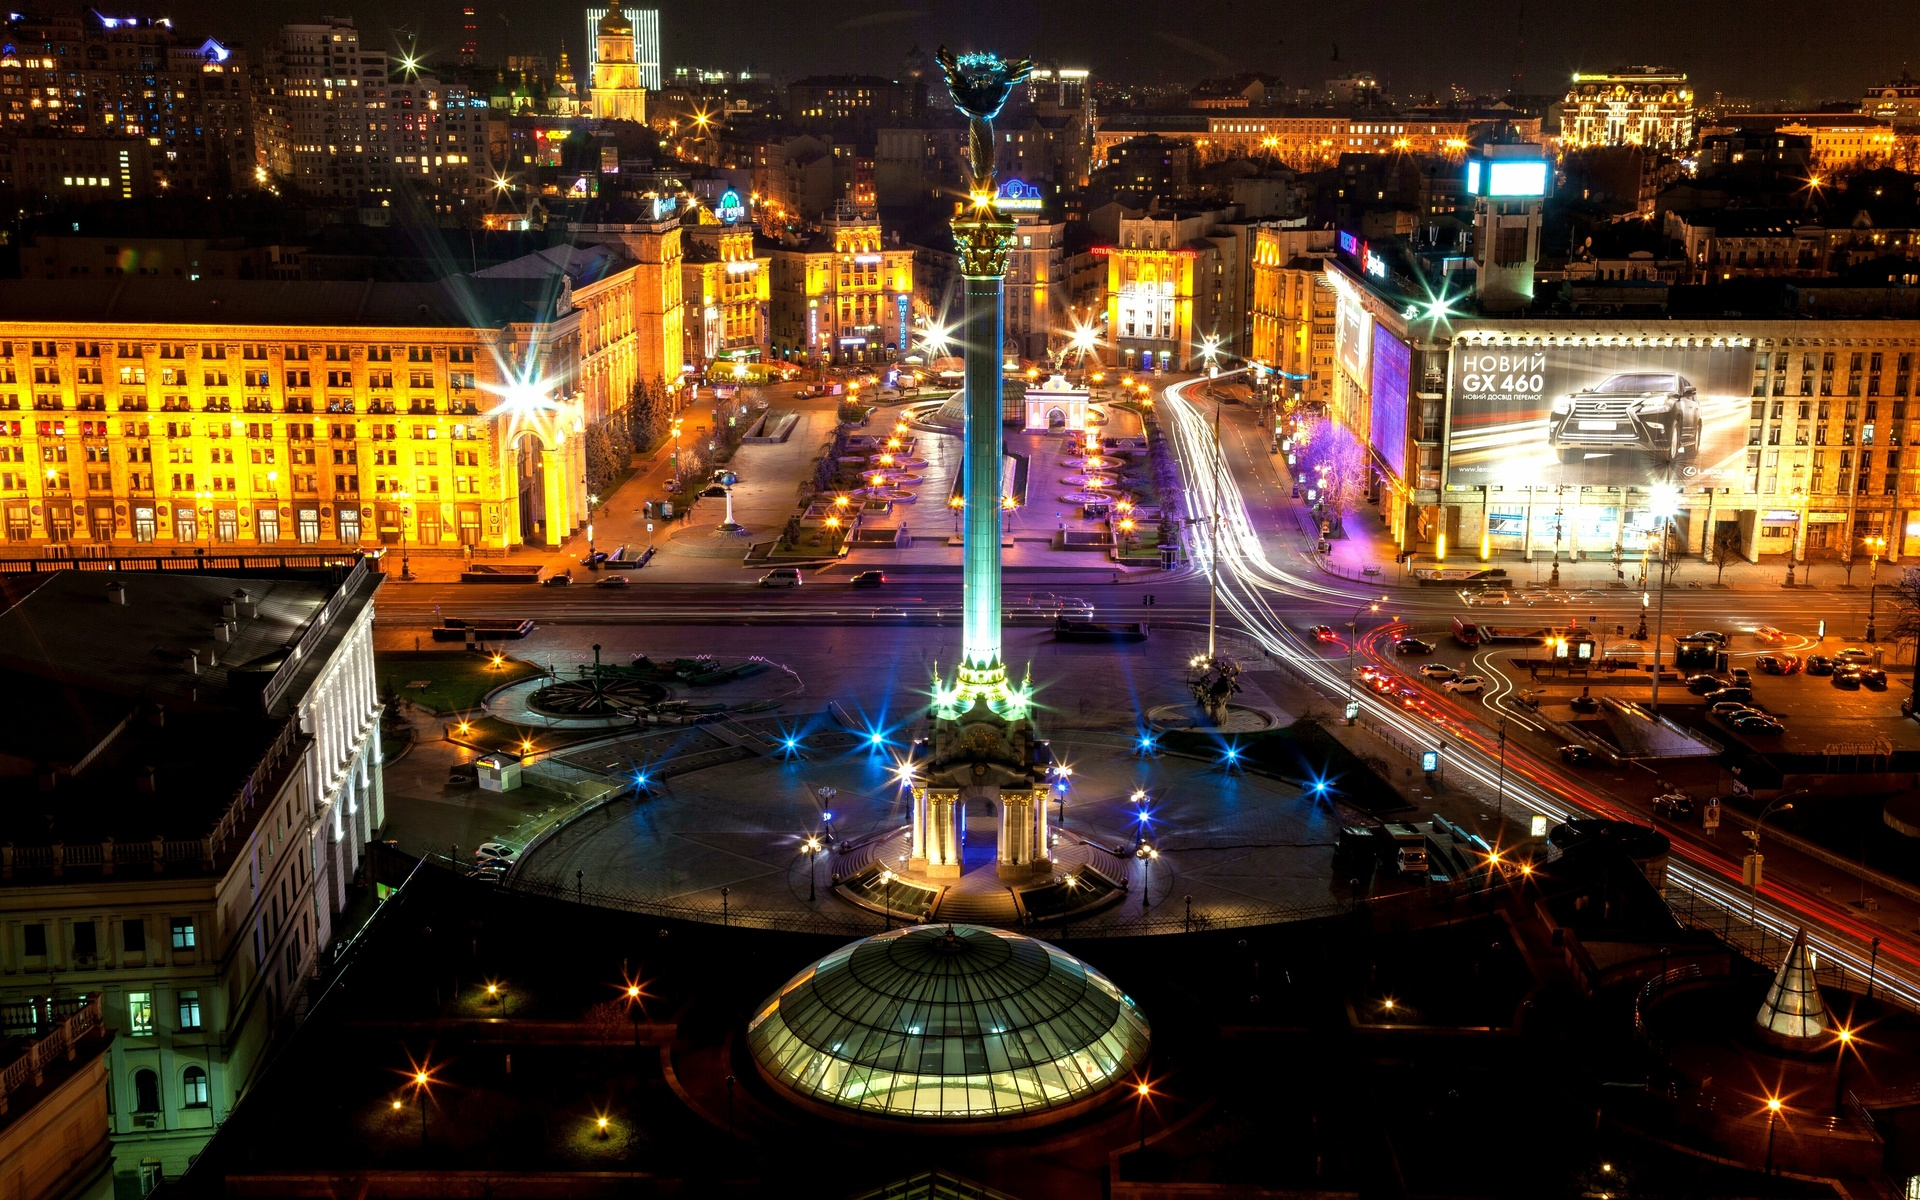 украина фотки города районе, где